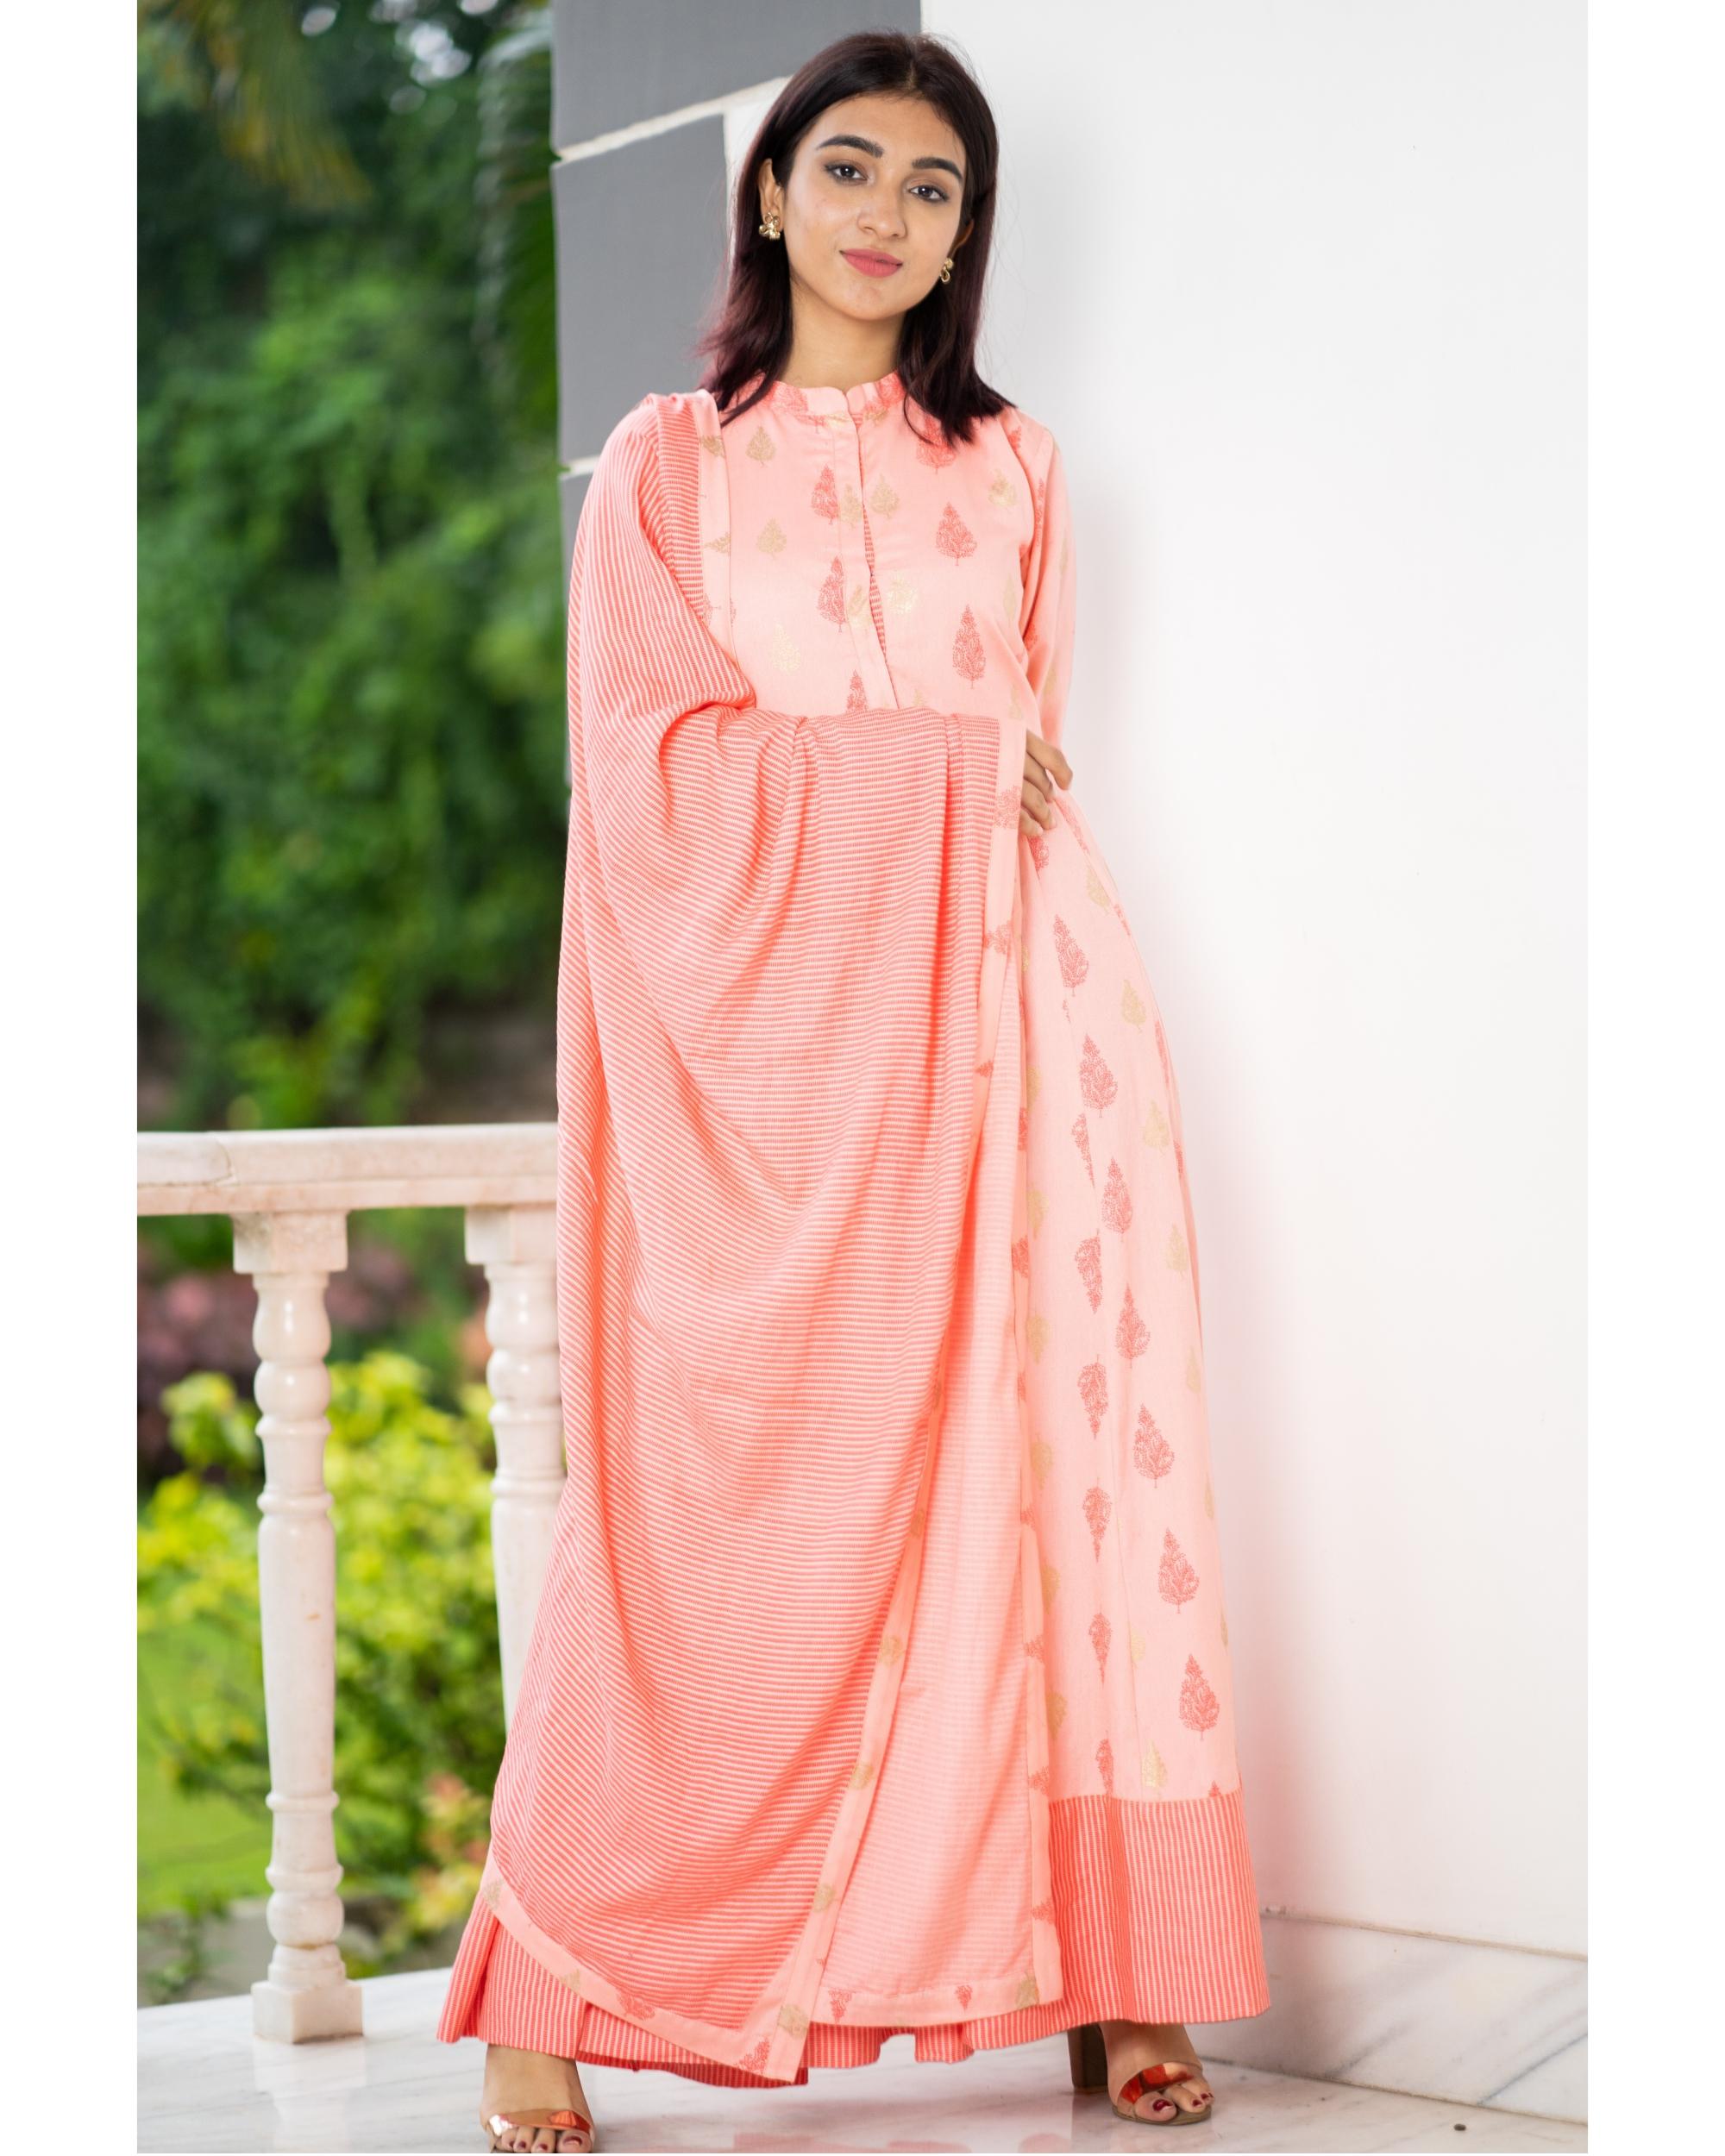 Salmon peach kalidaar dress with dupatta - set of two